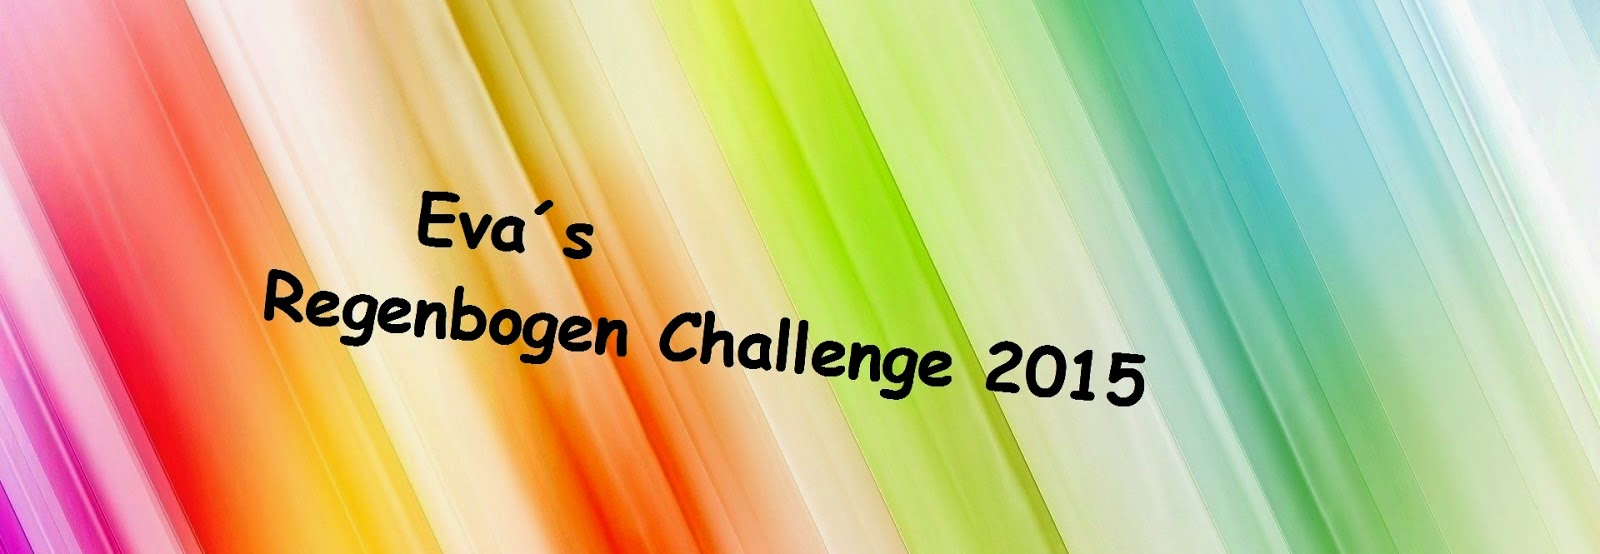 http://claudiasbuchstabenhimmel.blogspot.de/2015/02/evas-regenbogen-challenge-2015.html